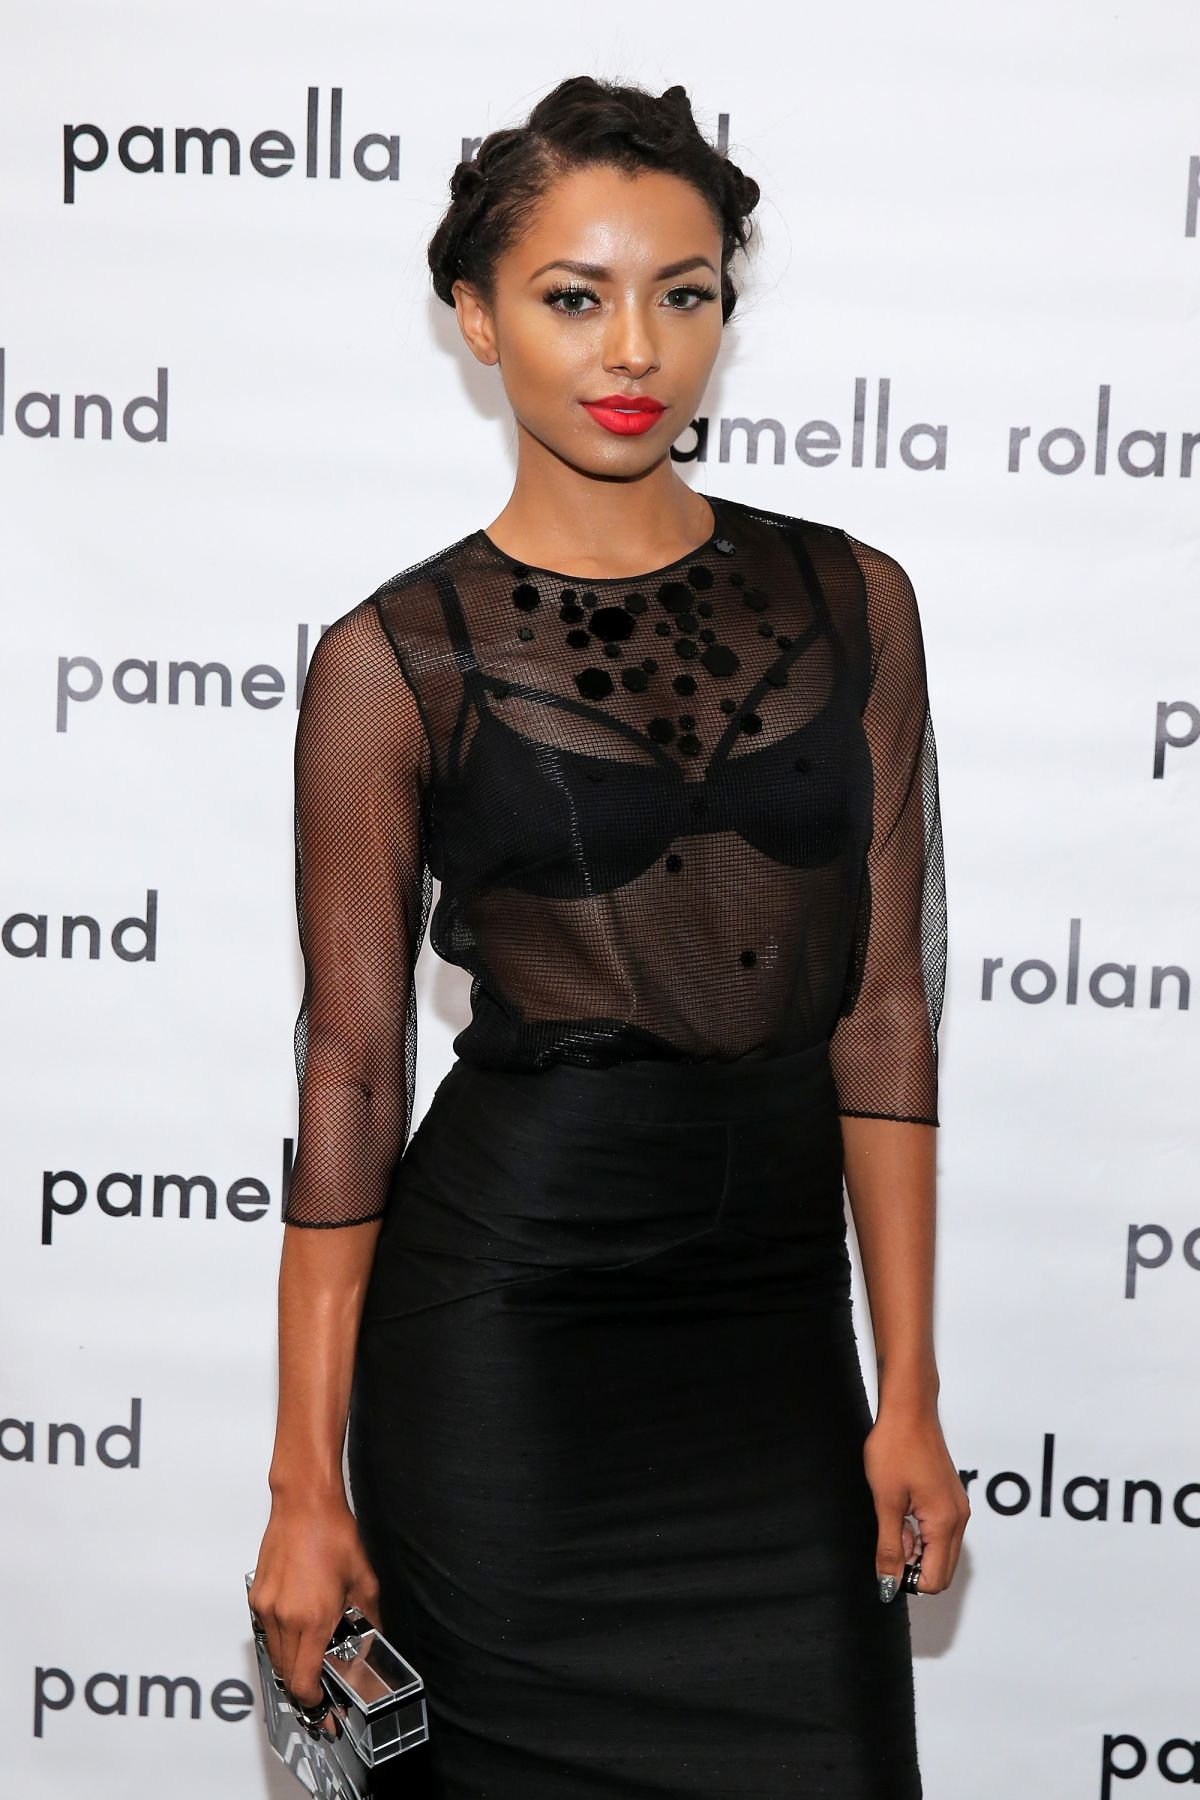 KAT GRAHAM at Pamella Roland Fashion Show in New York